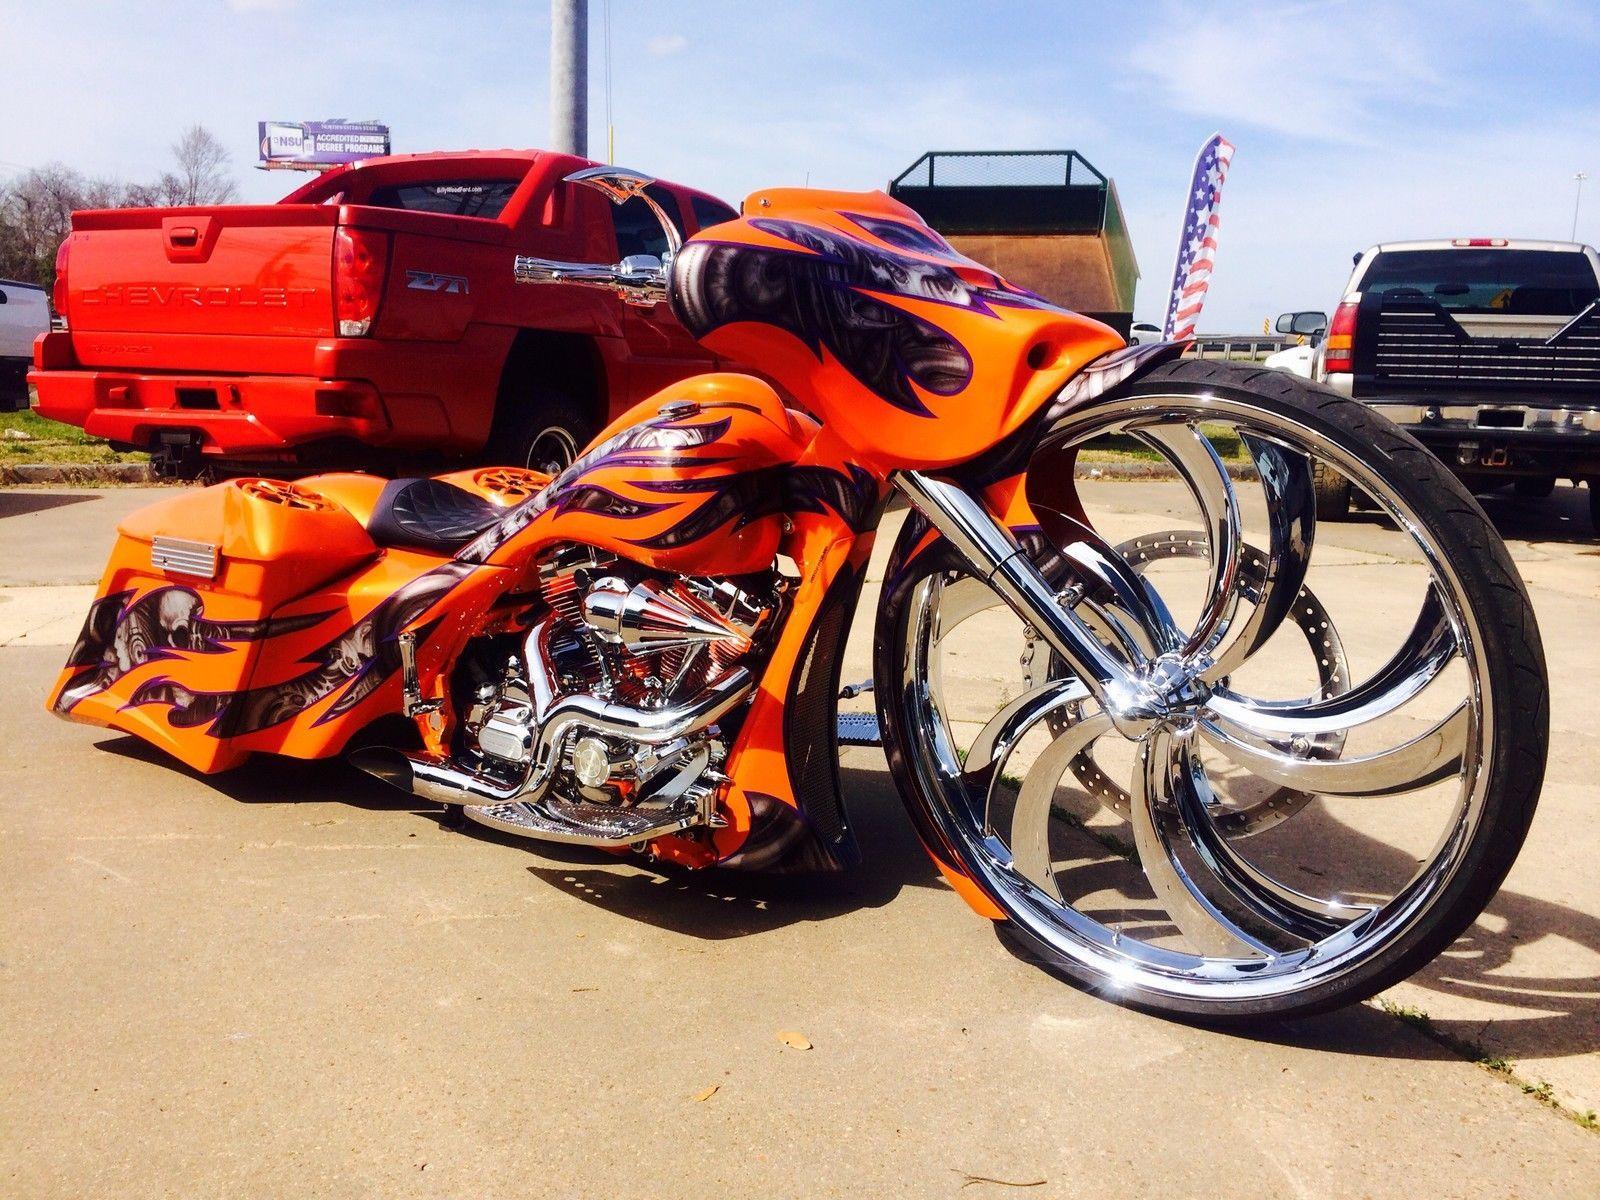 2010 Harley-Davidson Touring Streetglide Custom